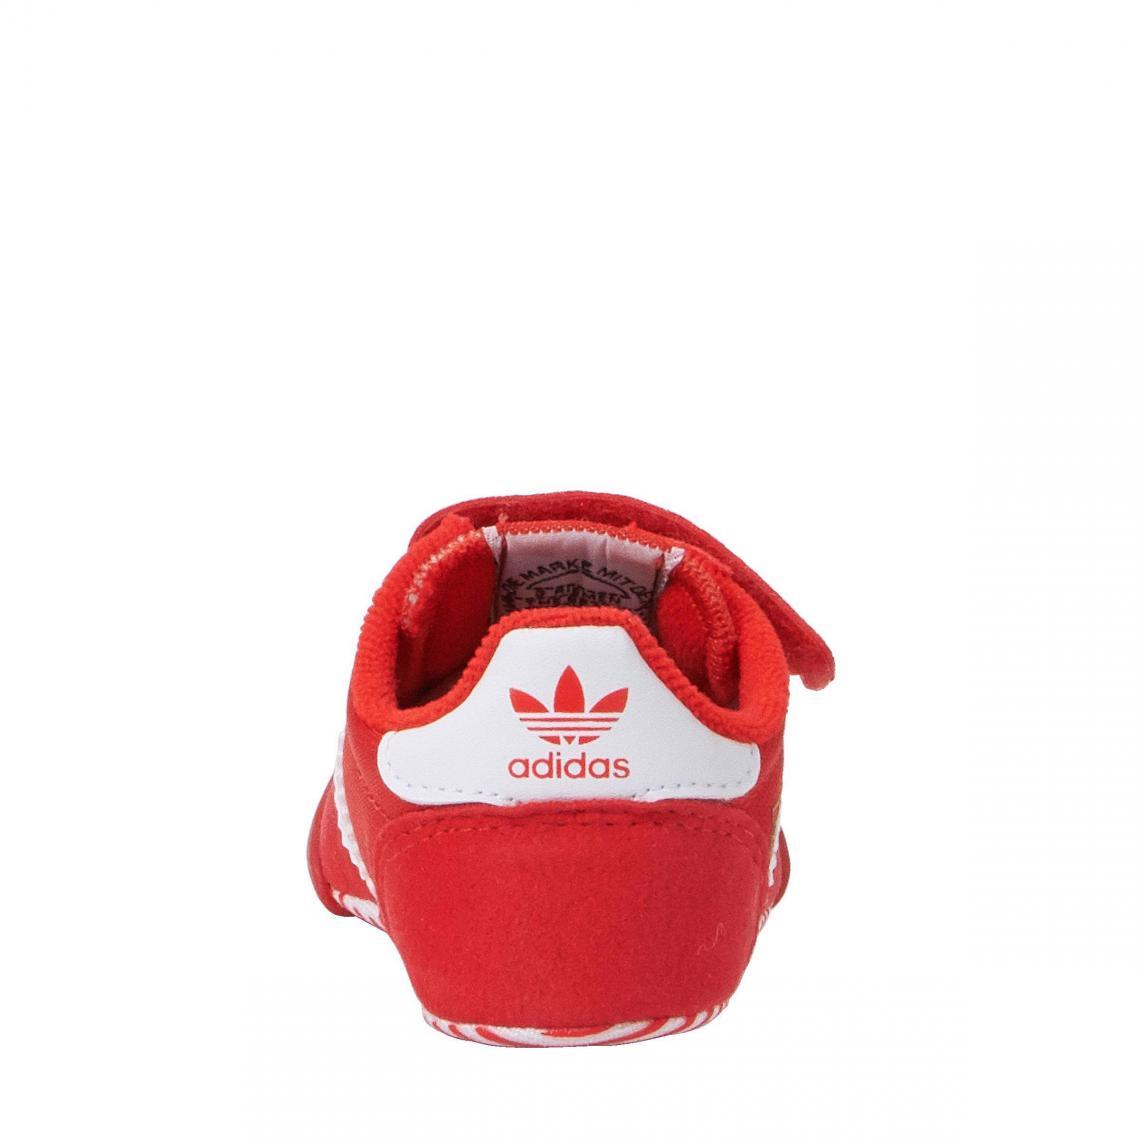 adidas suisse 3 3 chaussures dragon R5A3L4jq